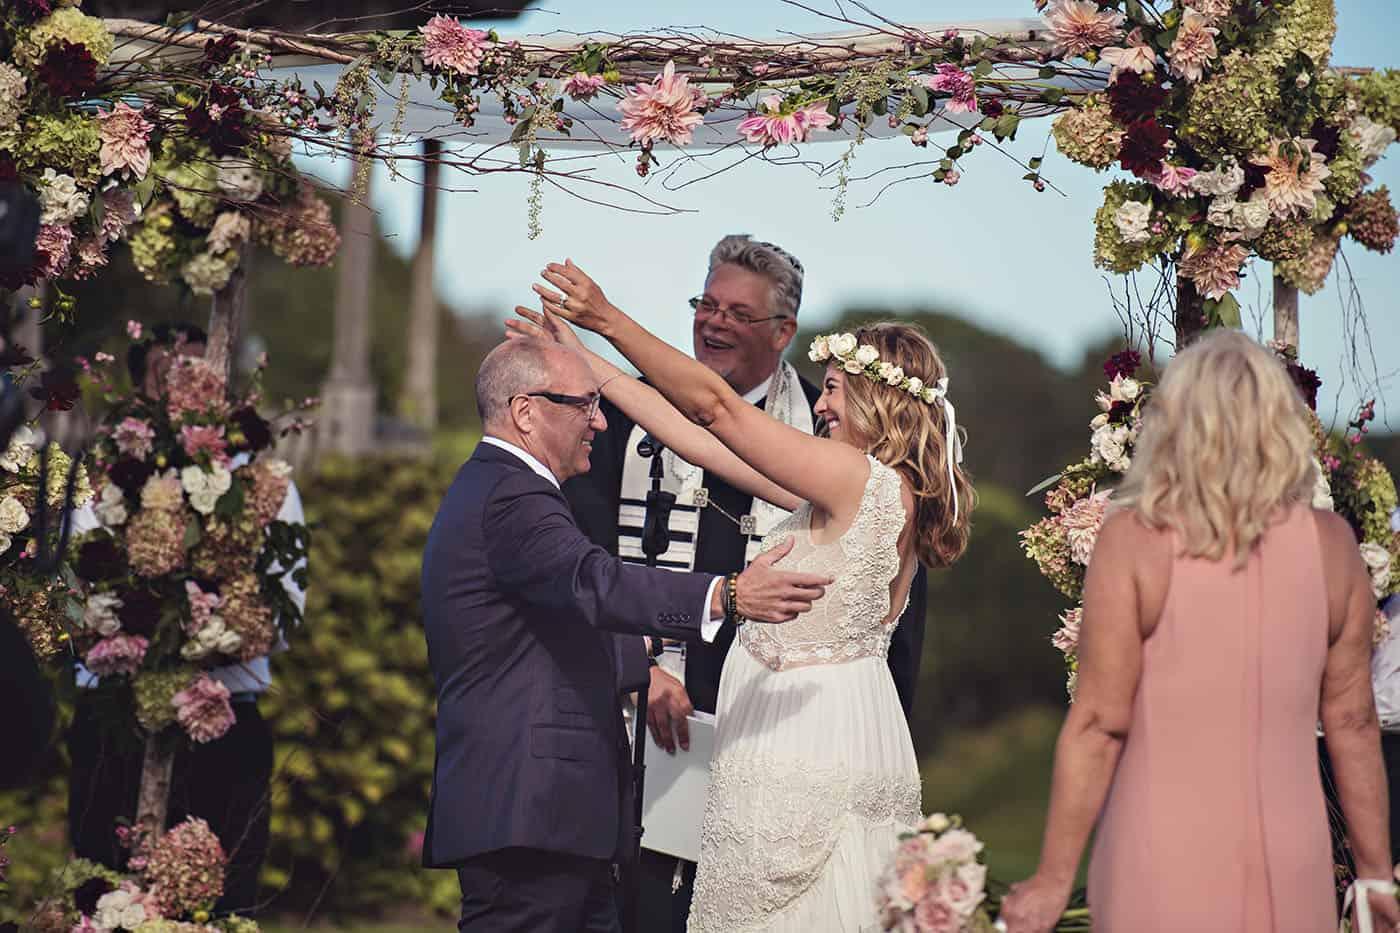 A Destination Wedding Photographer's Quick Guide